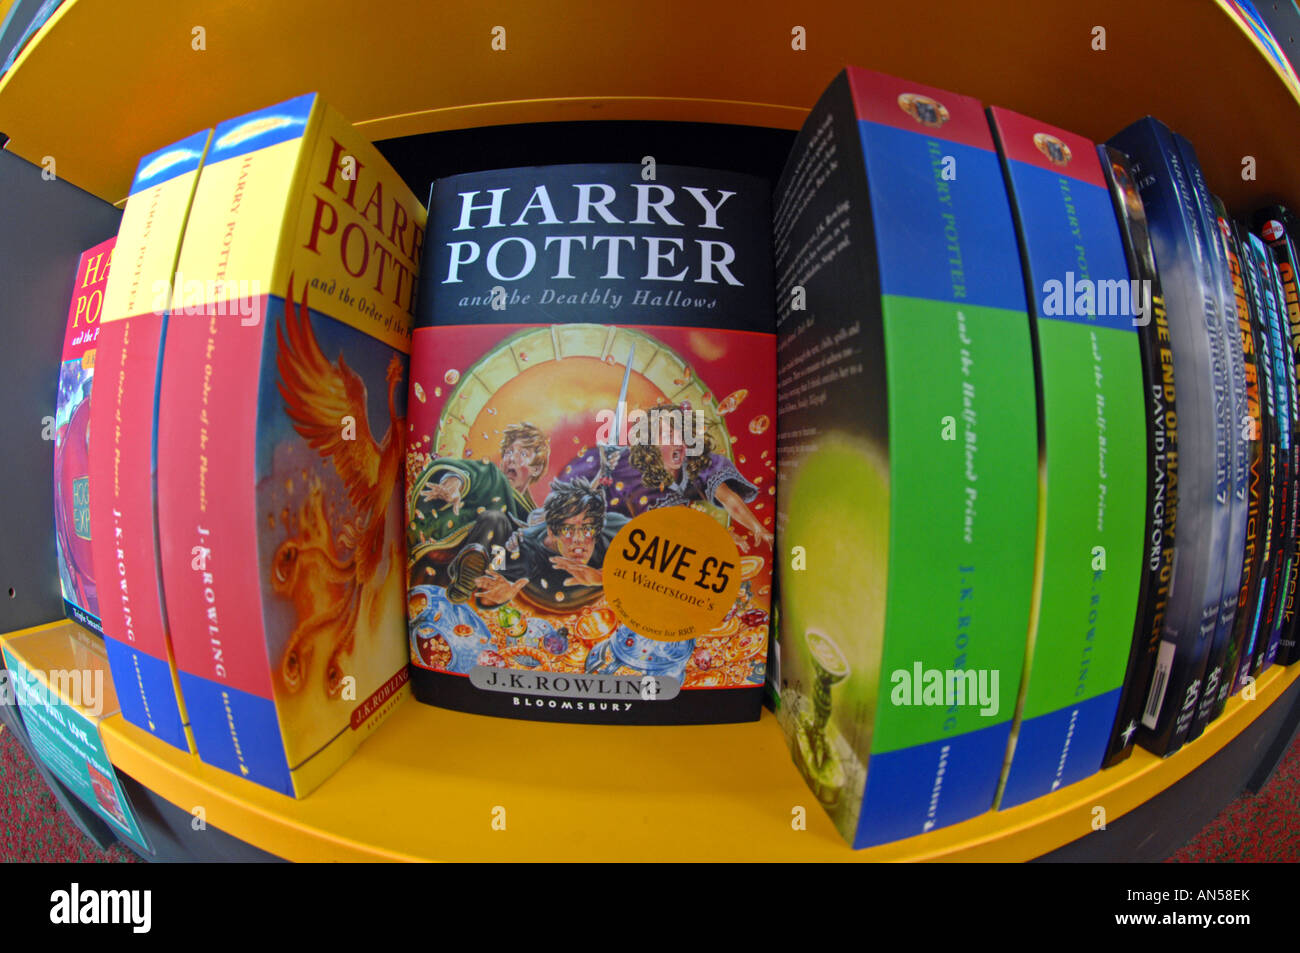 Harry Potter books - Stock Image